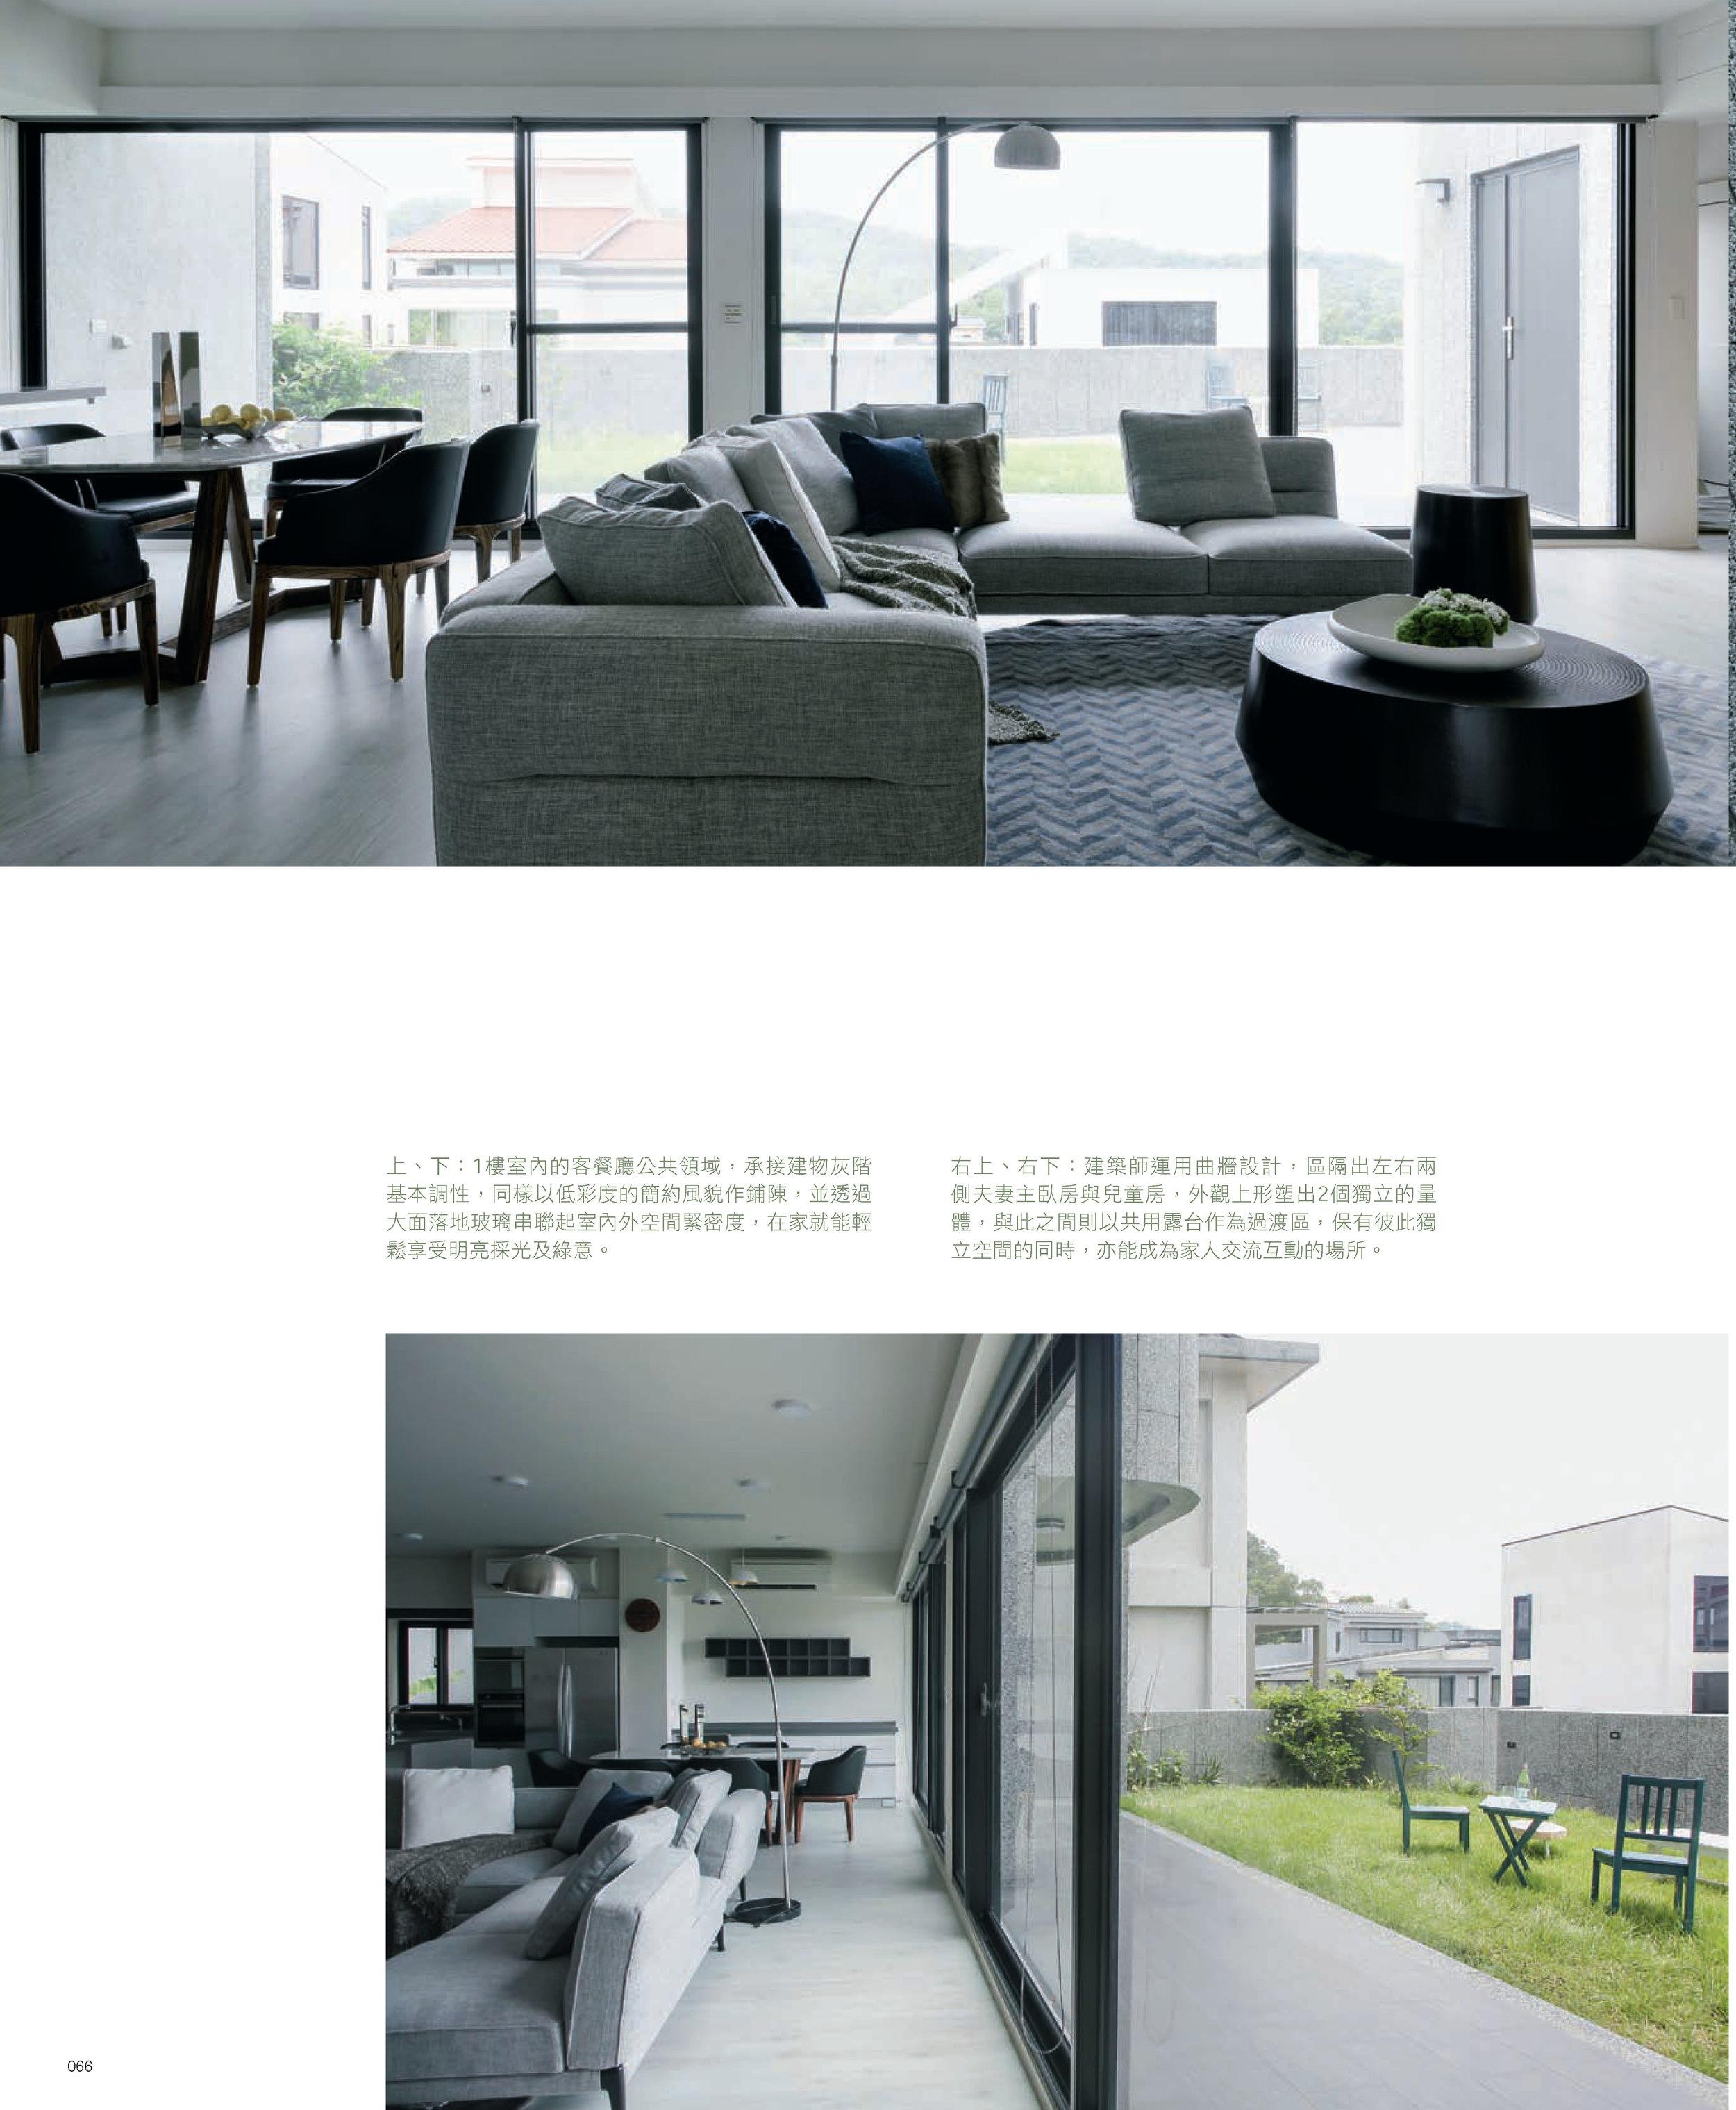 myhome201_SPACE_行一建築彭文苑建築師事務所_以空間動線、材質與自然做連結 揉合三代生活軌跡的光合之家_頁面_6.jpg